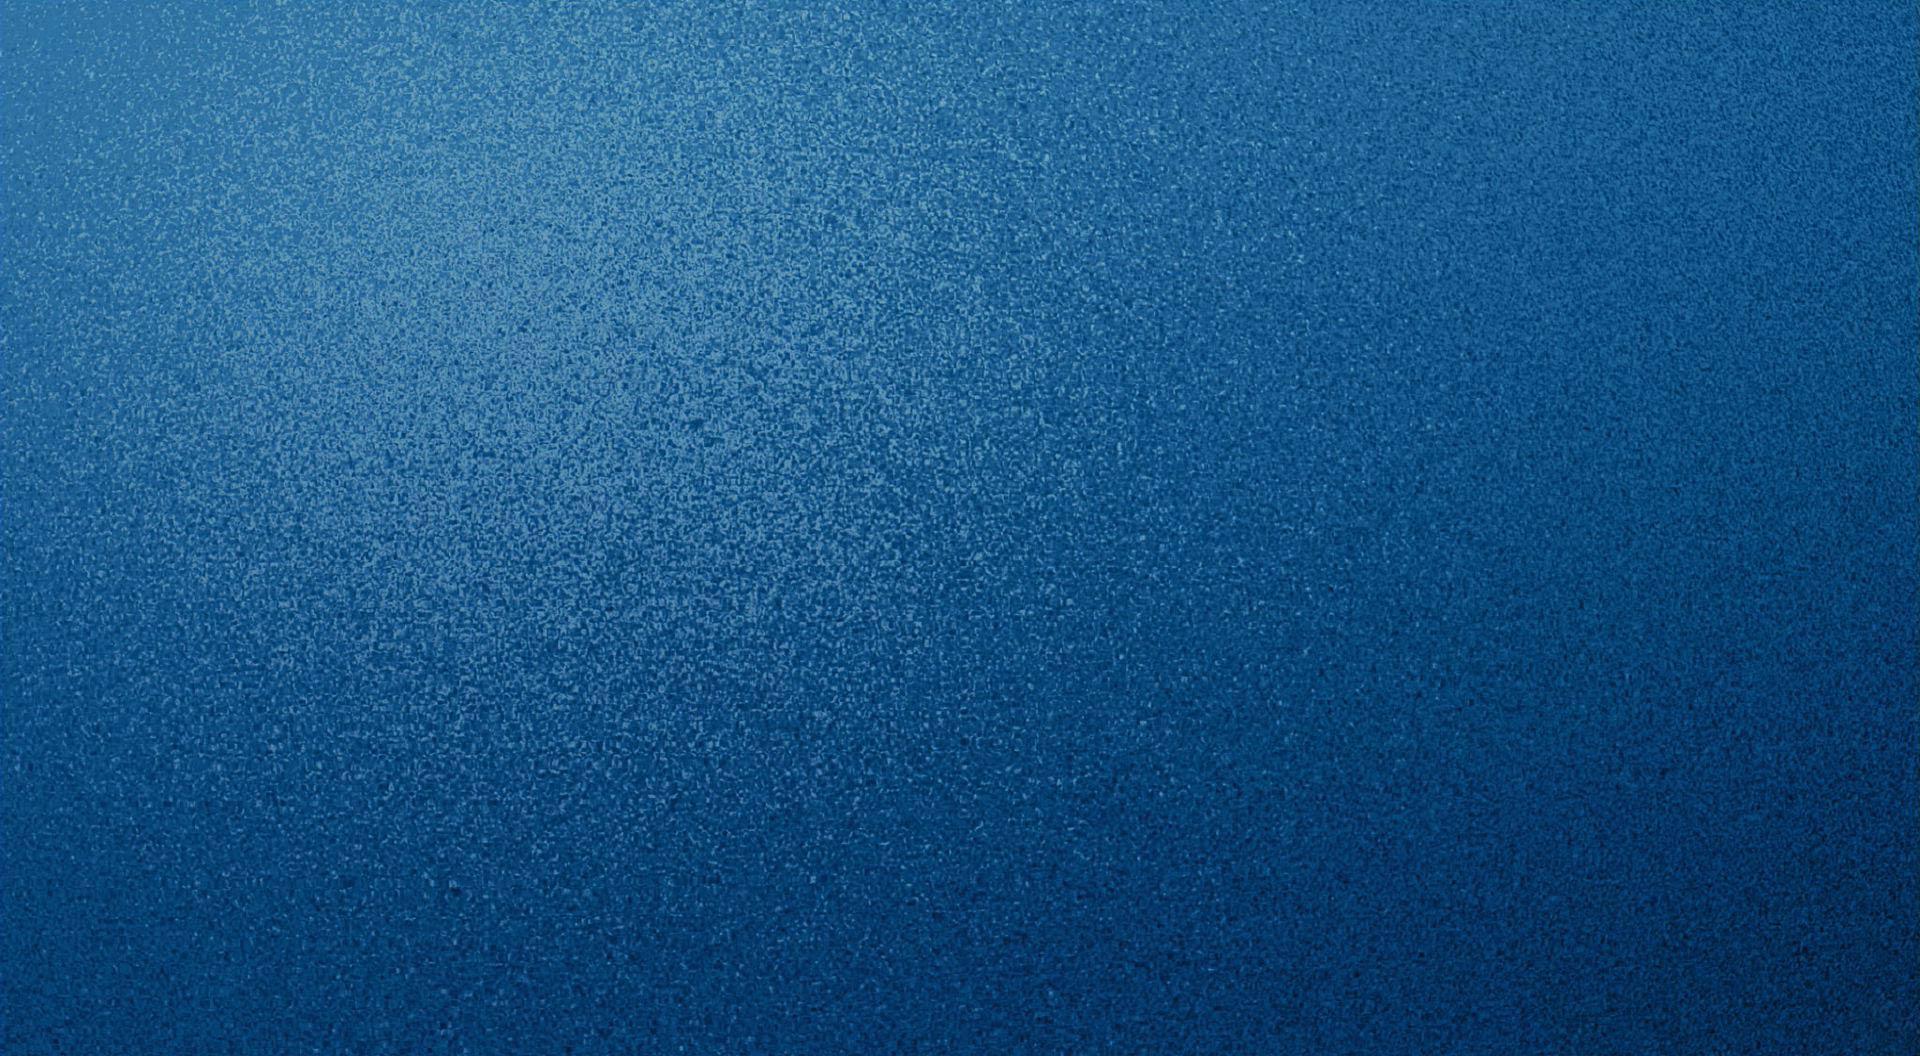 blue bakground